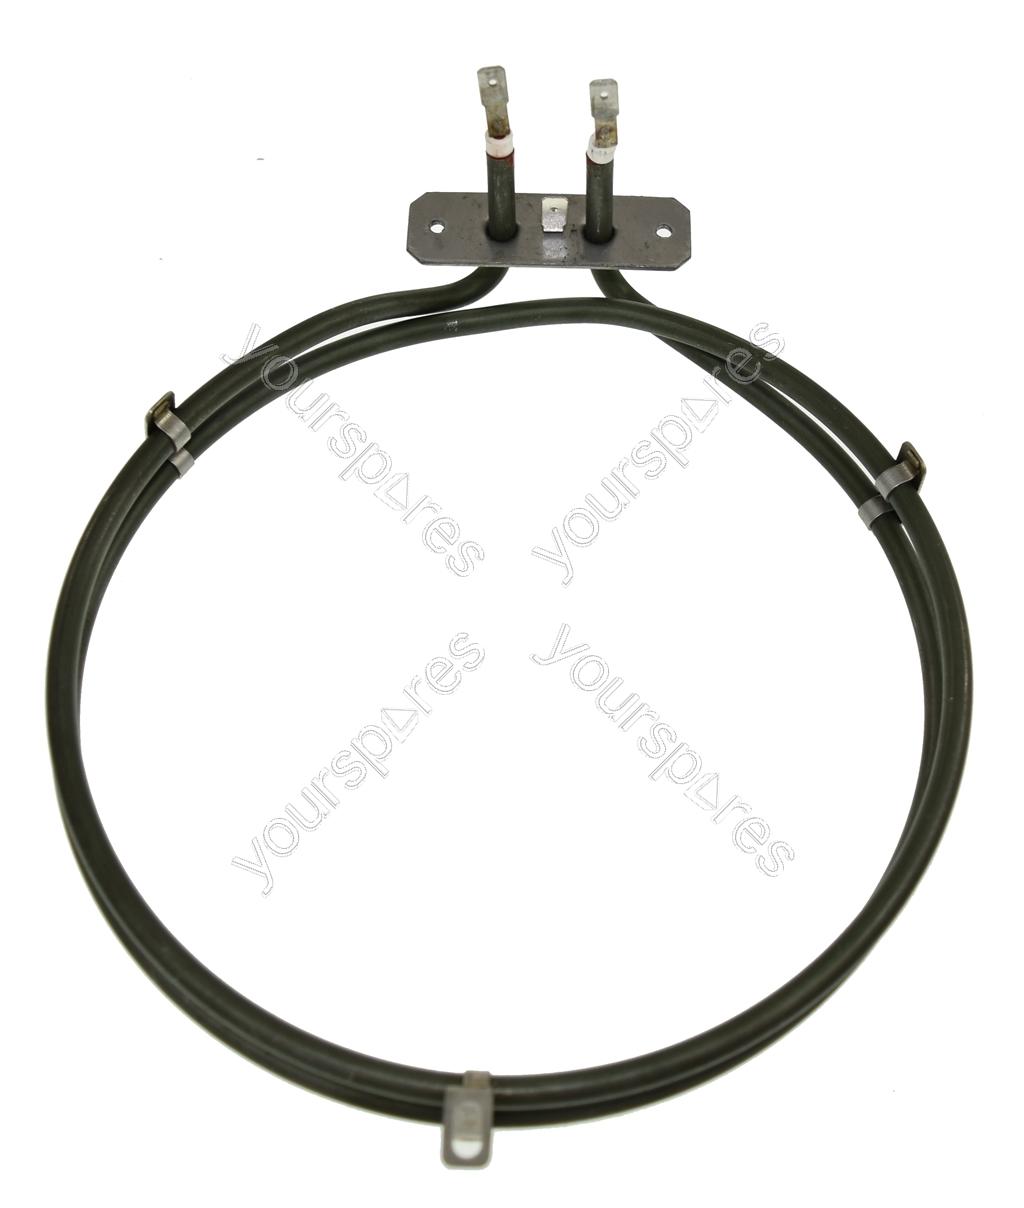 Beko Replacement Fan Oven Cooker Heating Element. (1800w